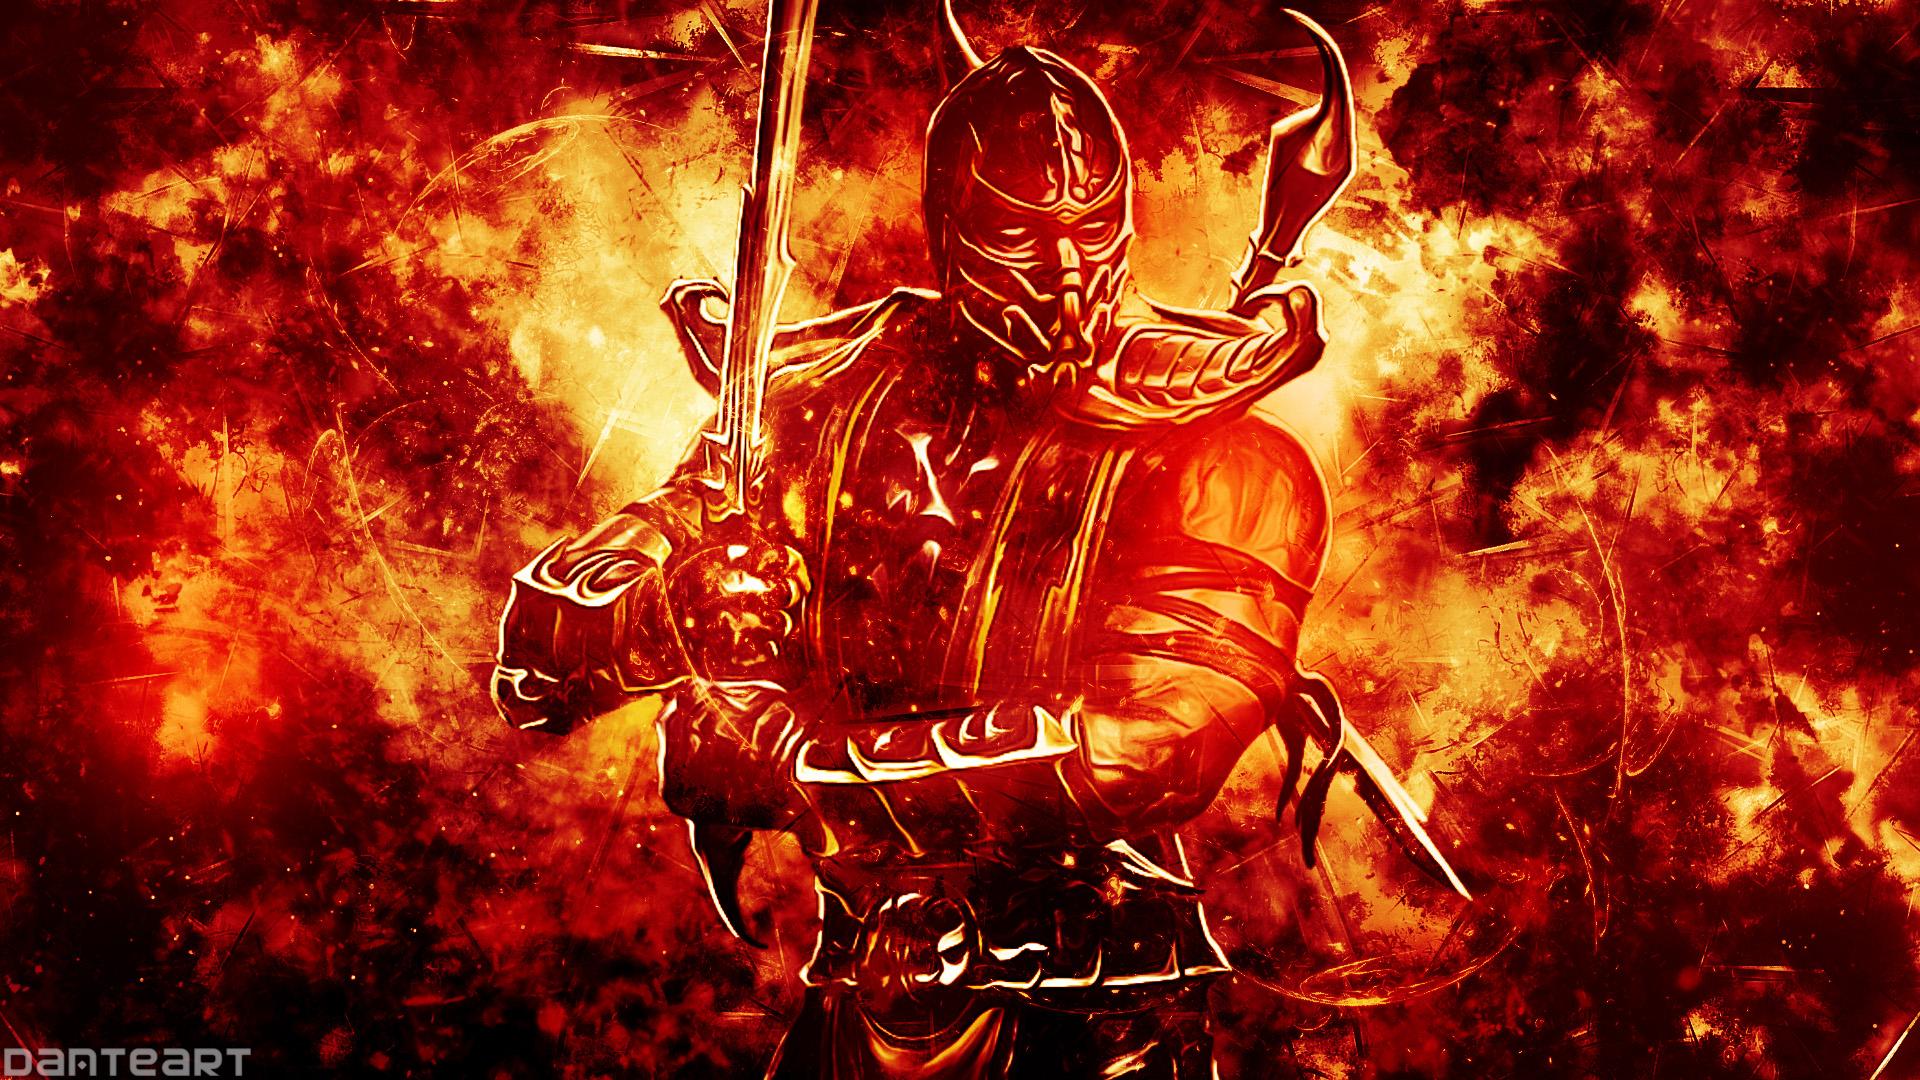 54 Scorpion Mortal Kombat Hd Wallpapers: Pictures Of Scorpion From Mortal Kombat On Fire With HD